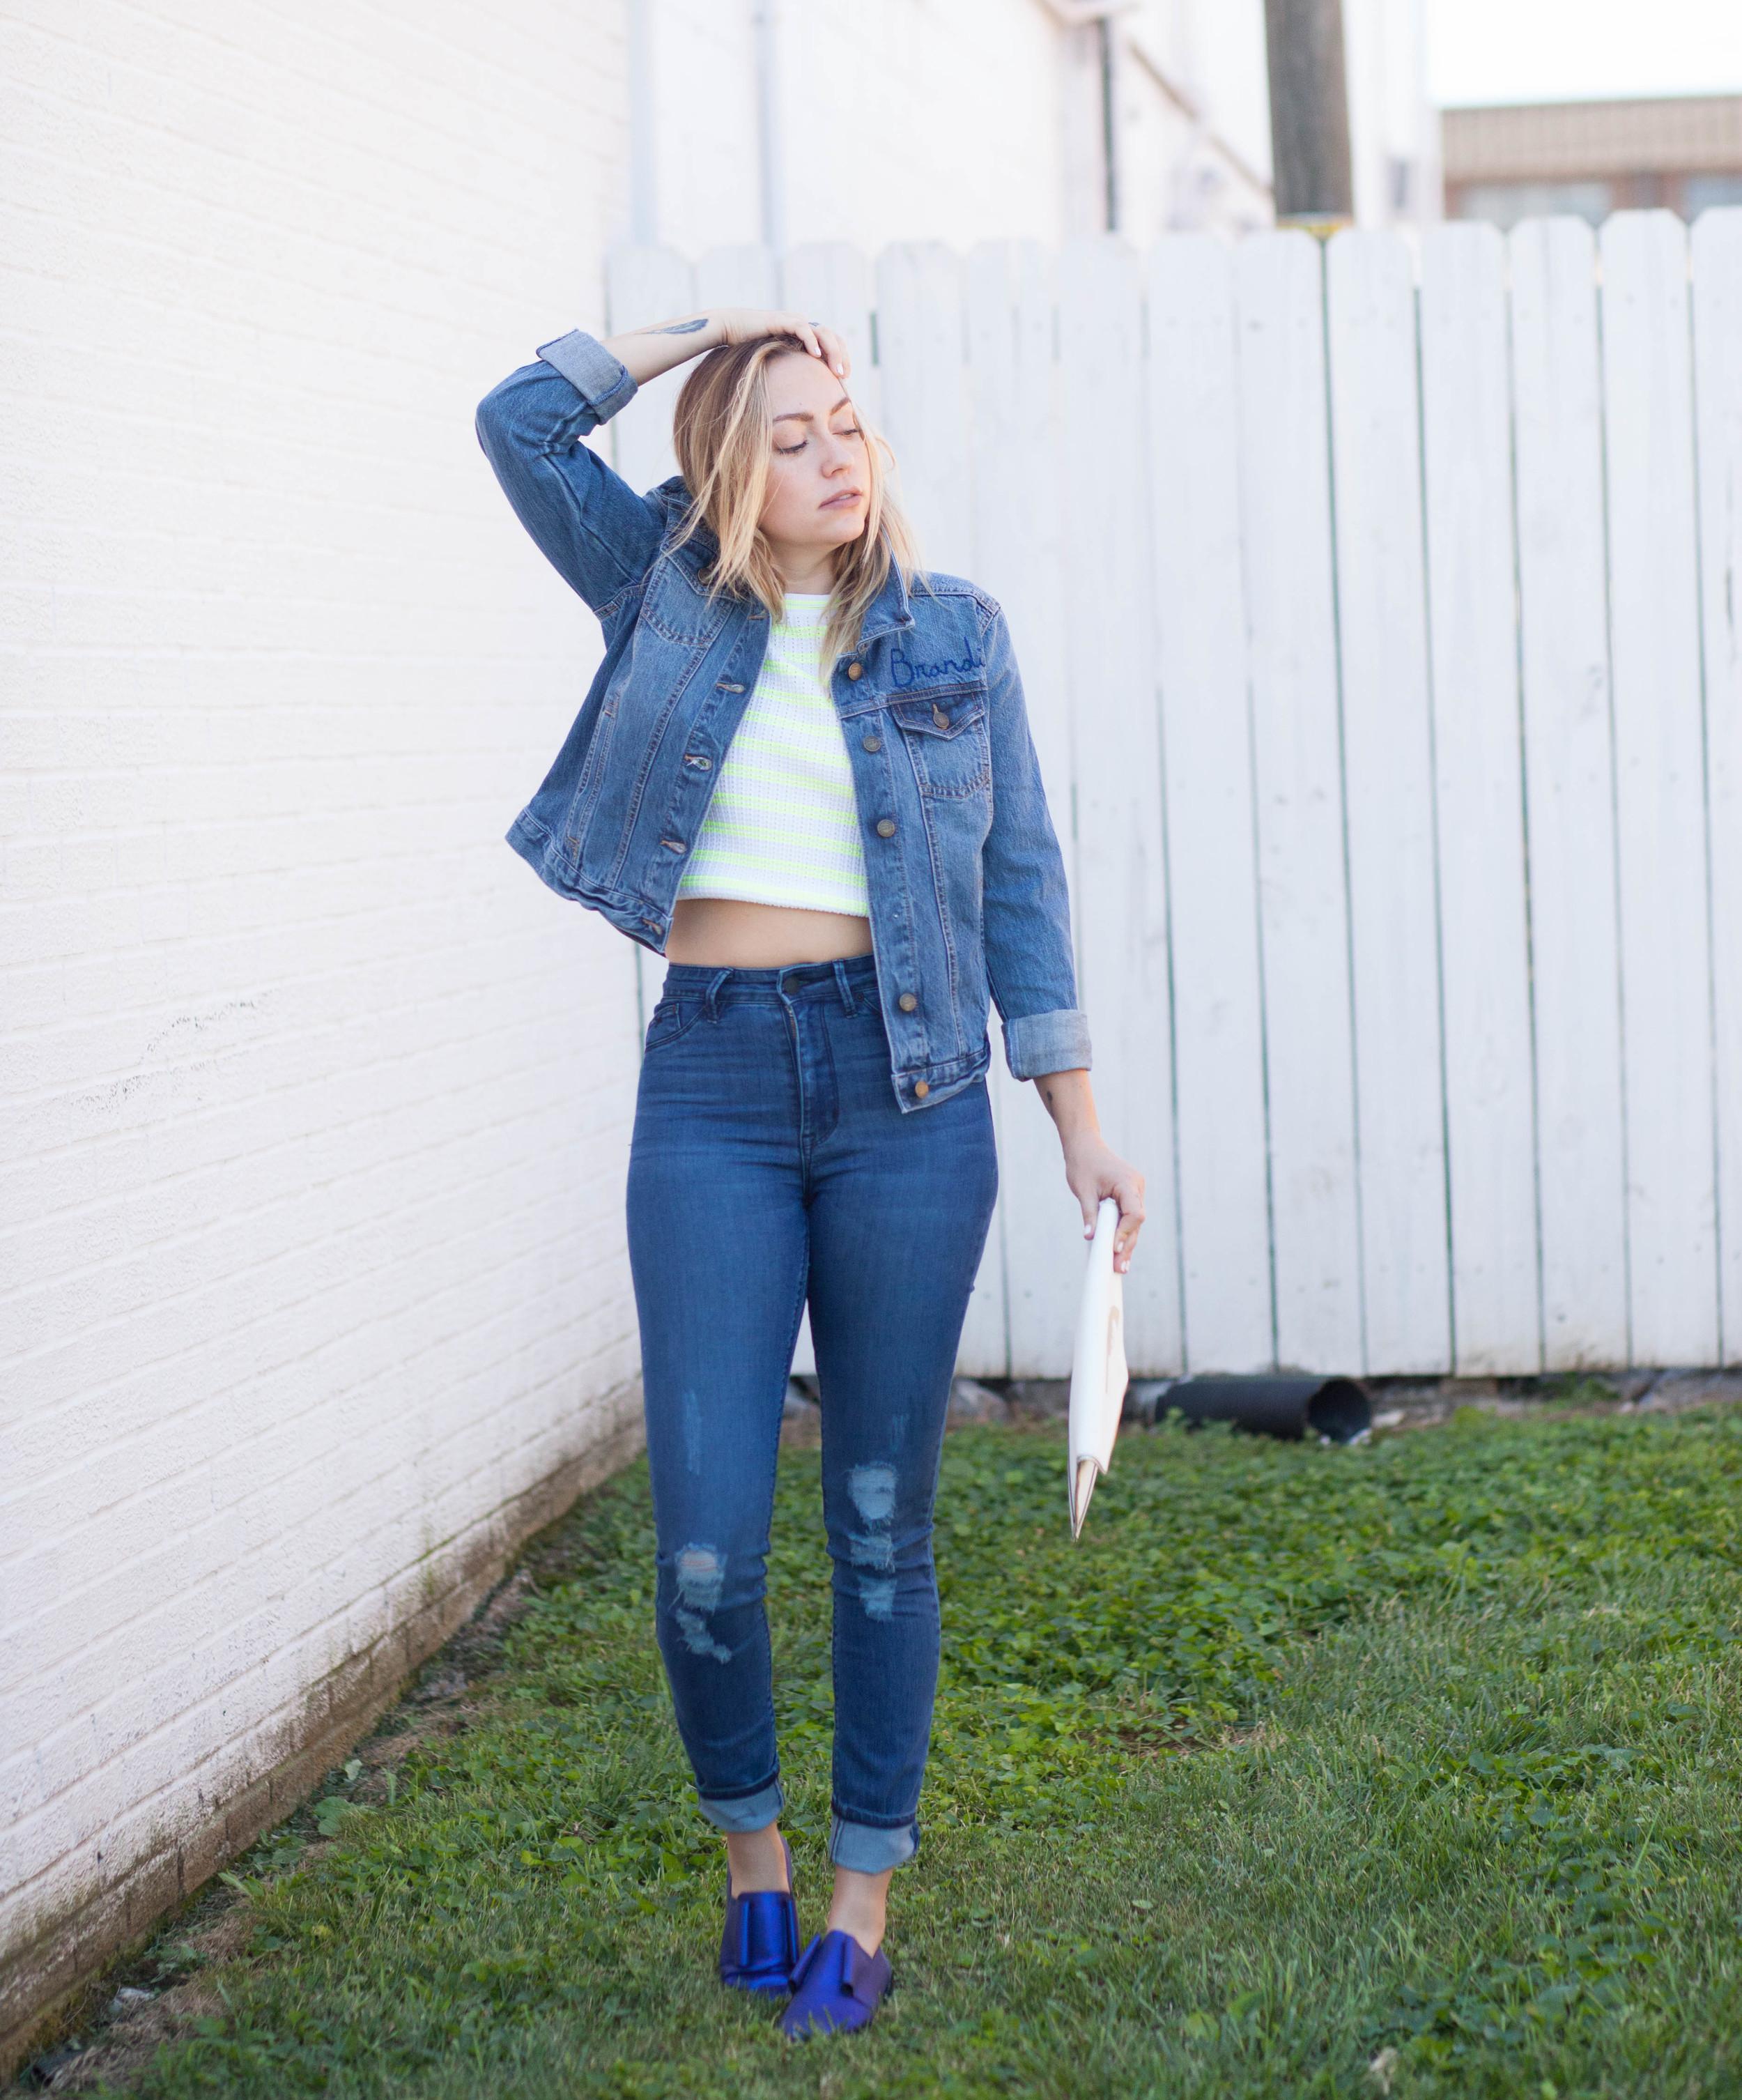 Top - Elizabeth + James   Jeans - RES Denim   Jacket - LOFT   Shoes - Miista   Clutch - DTLA Custom / Rebecca Minkoff     photos by  Mandy Mooring